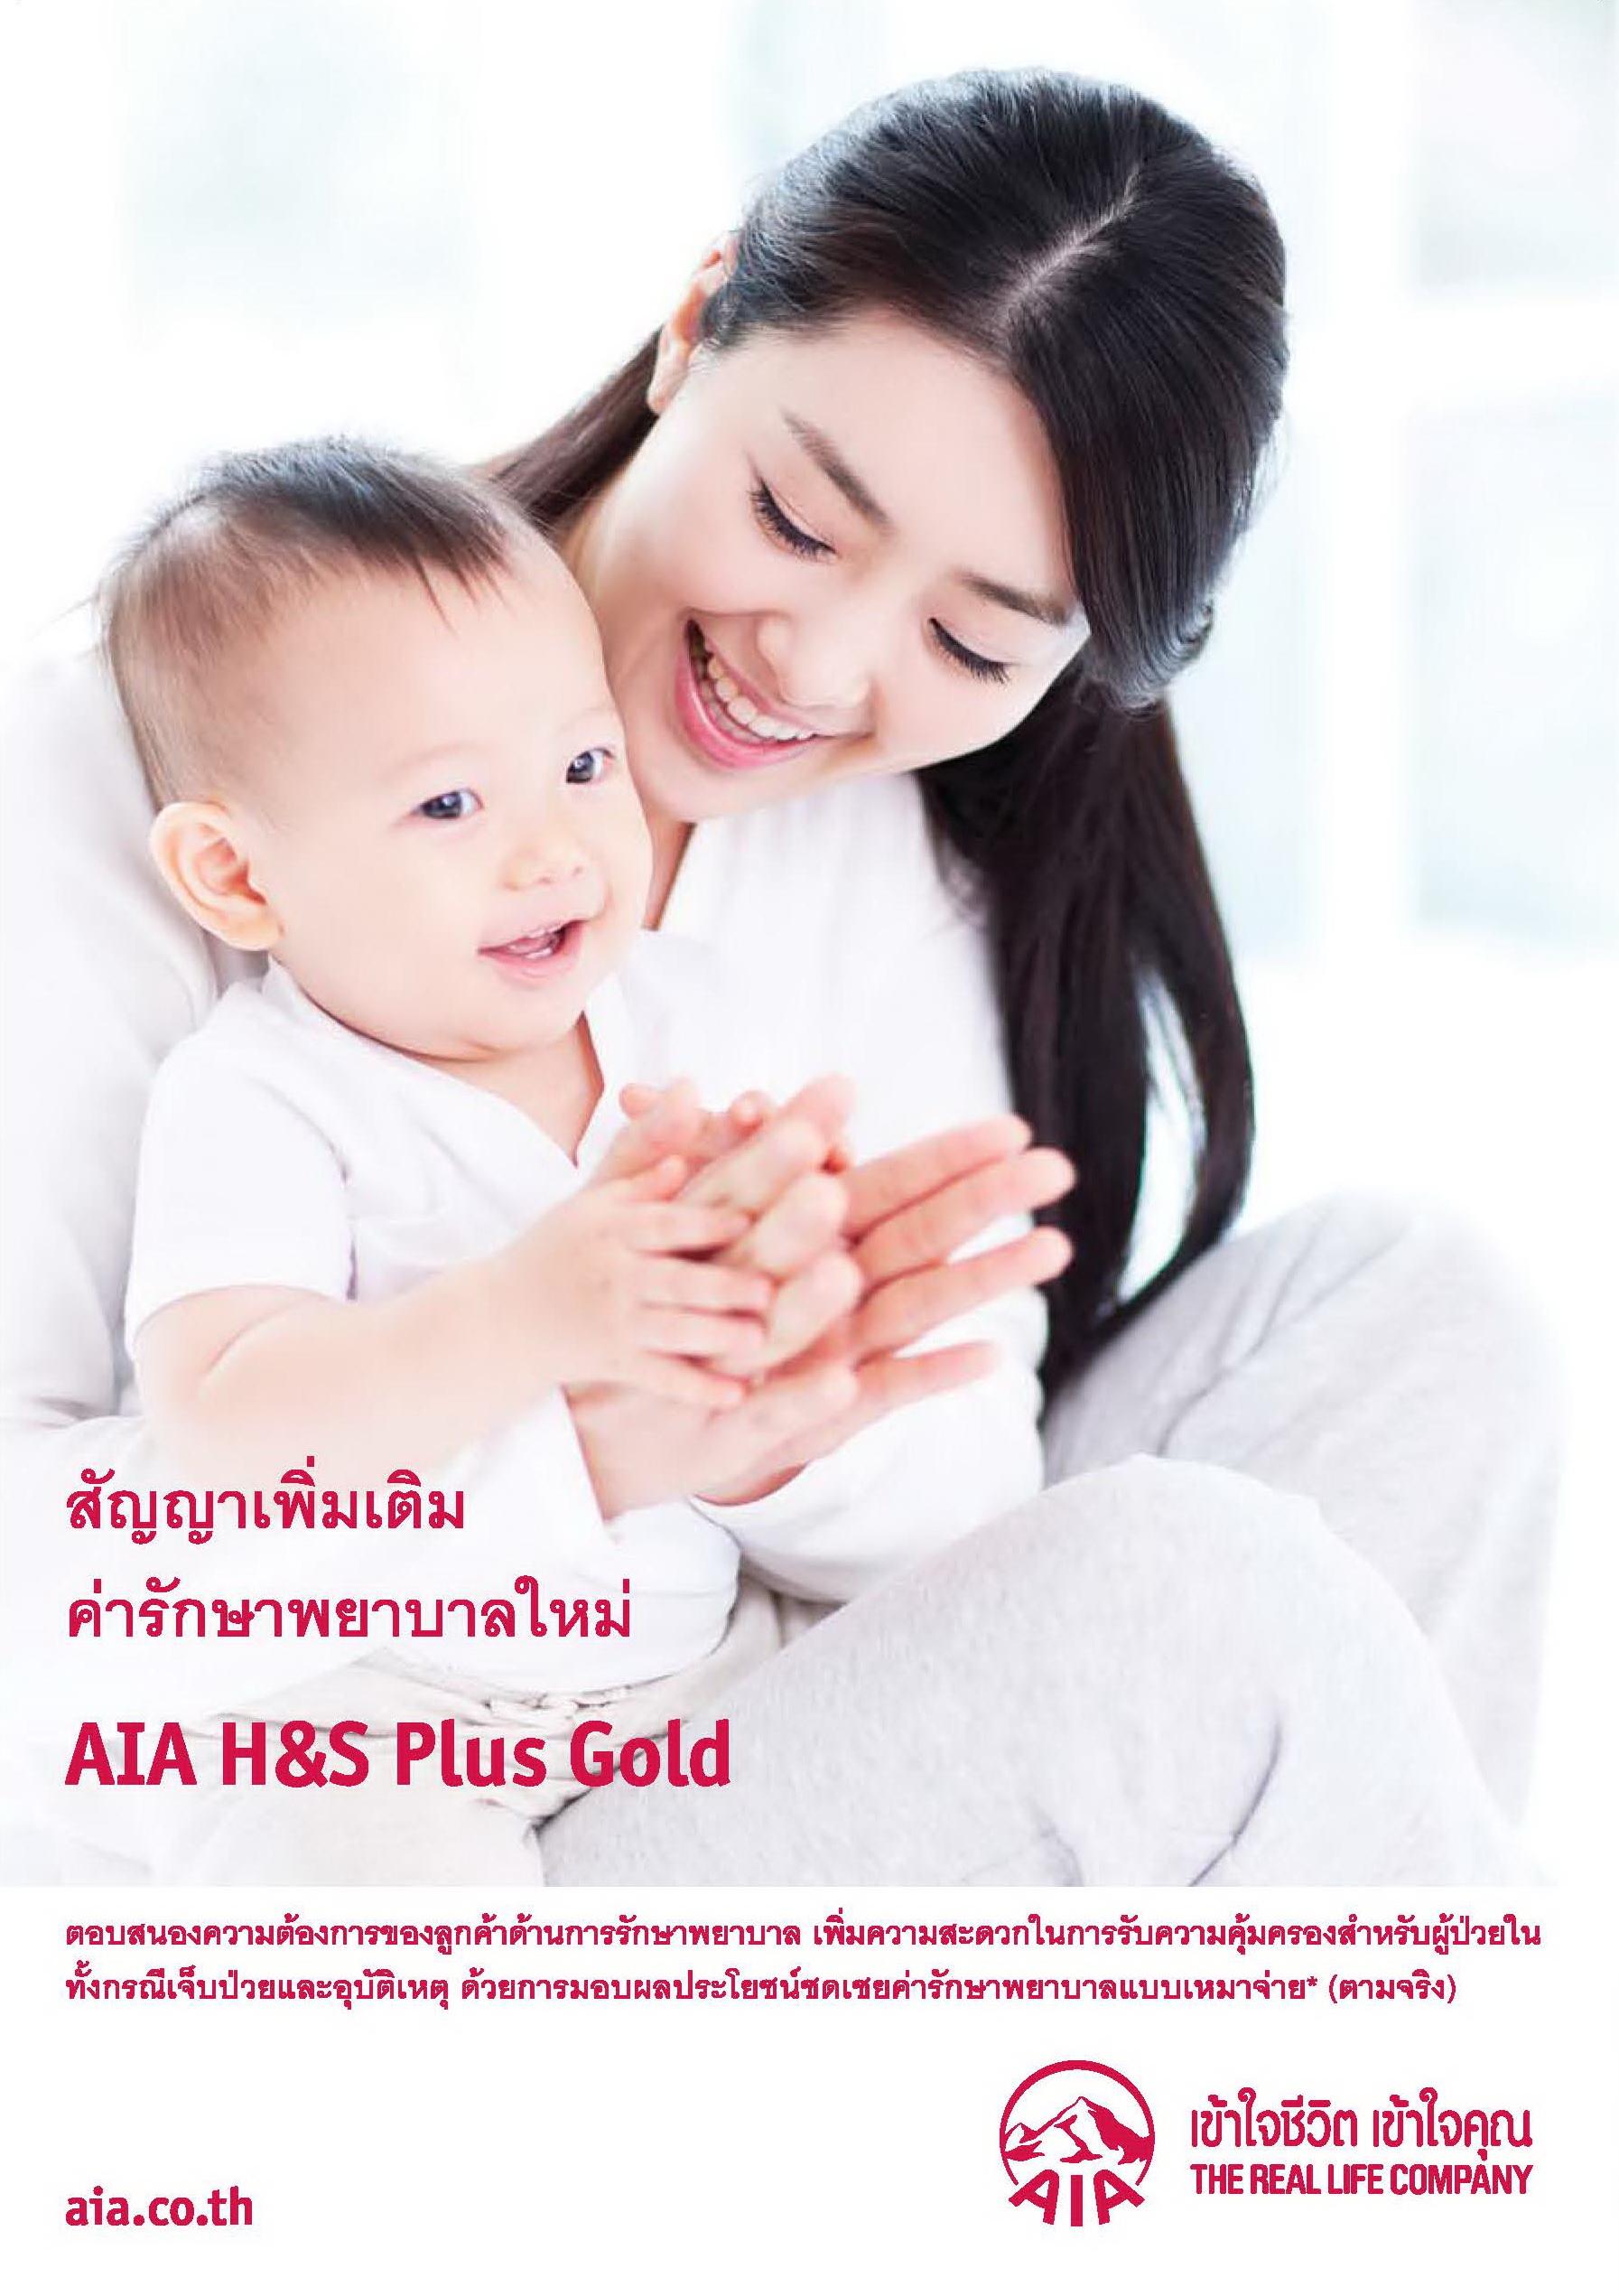 AIA-HS-Plus-Gold ประกันสุขภาพเหมาจ่ายใหม่ เอไอเอ